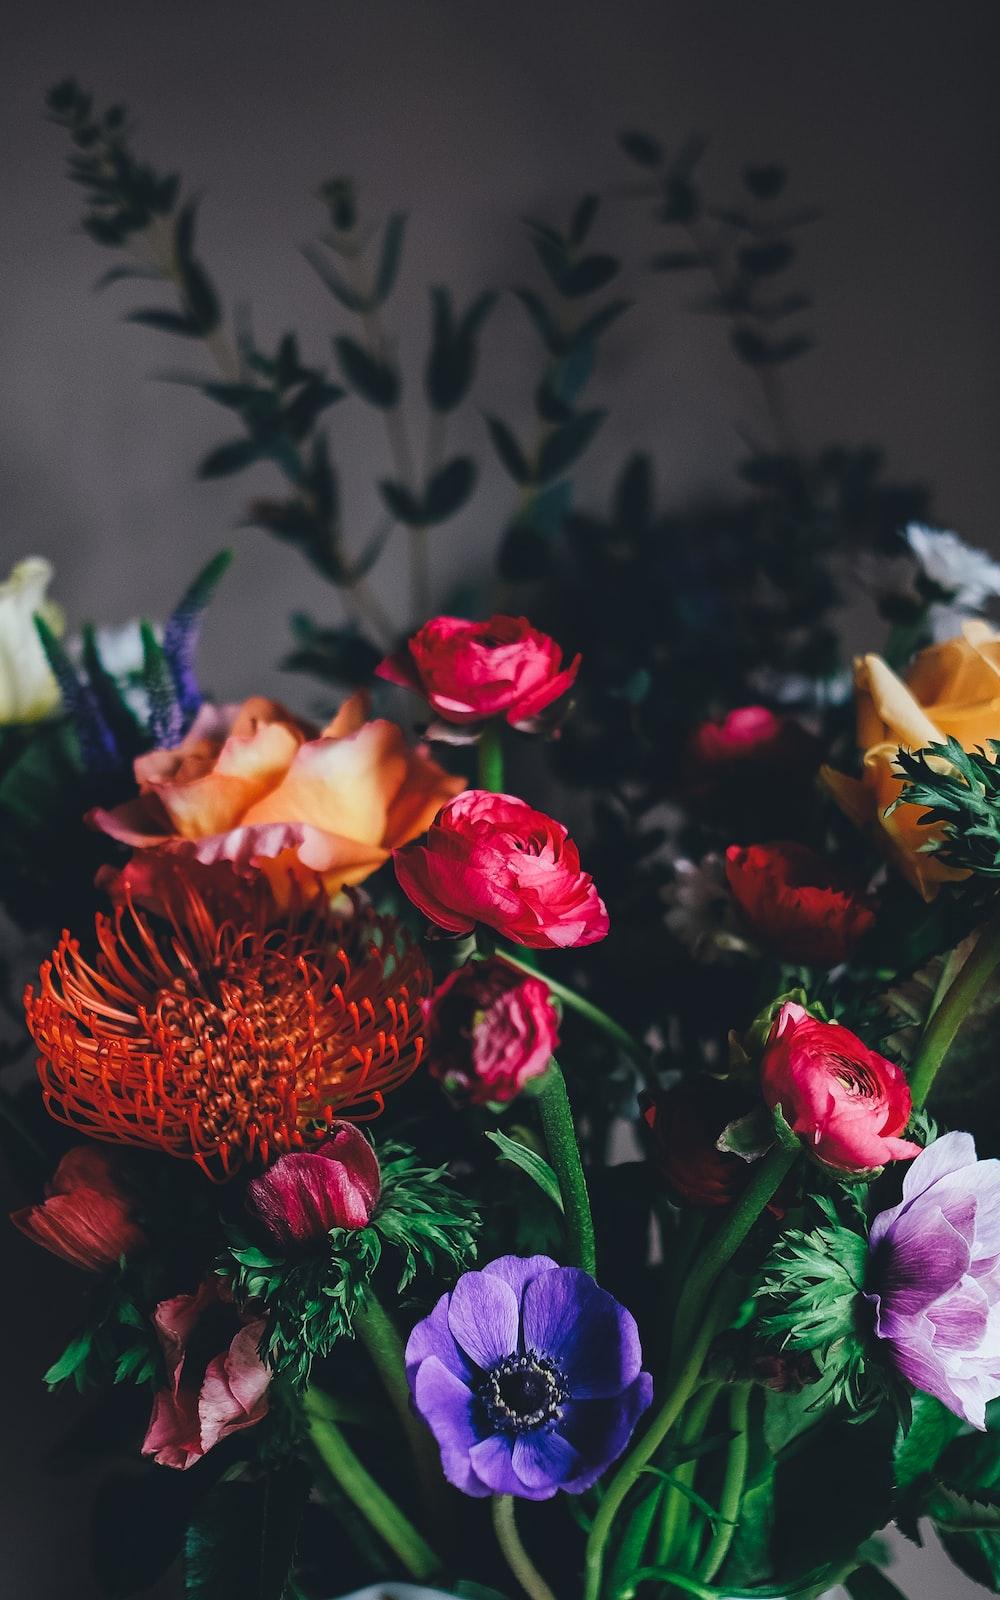 assorted petaled flowers centerpiece inside room